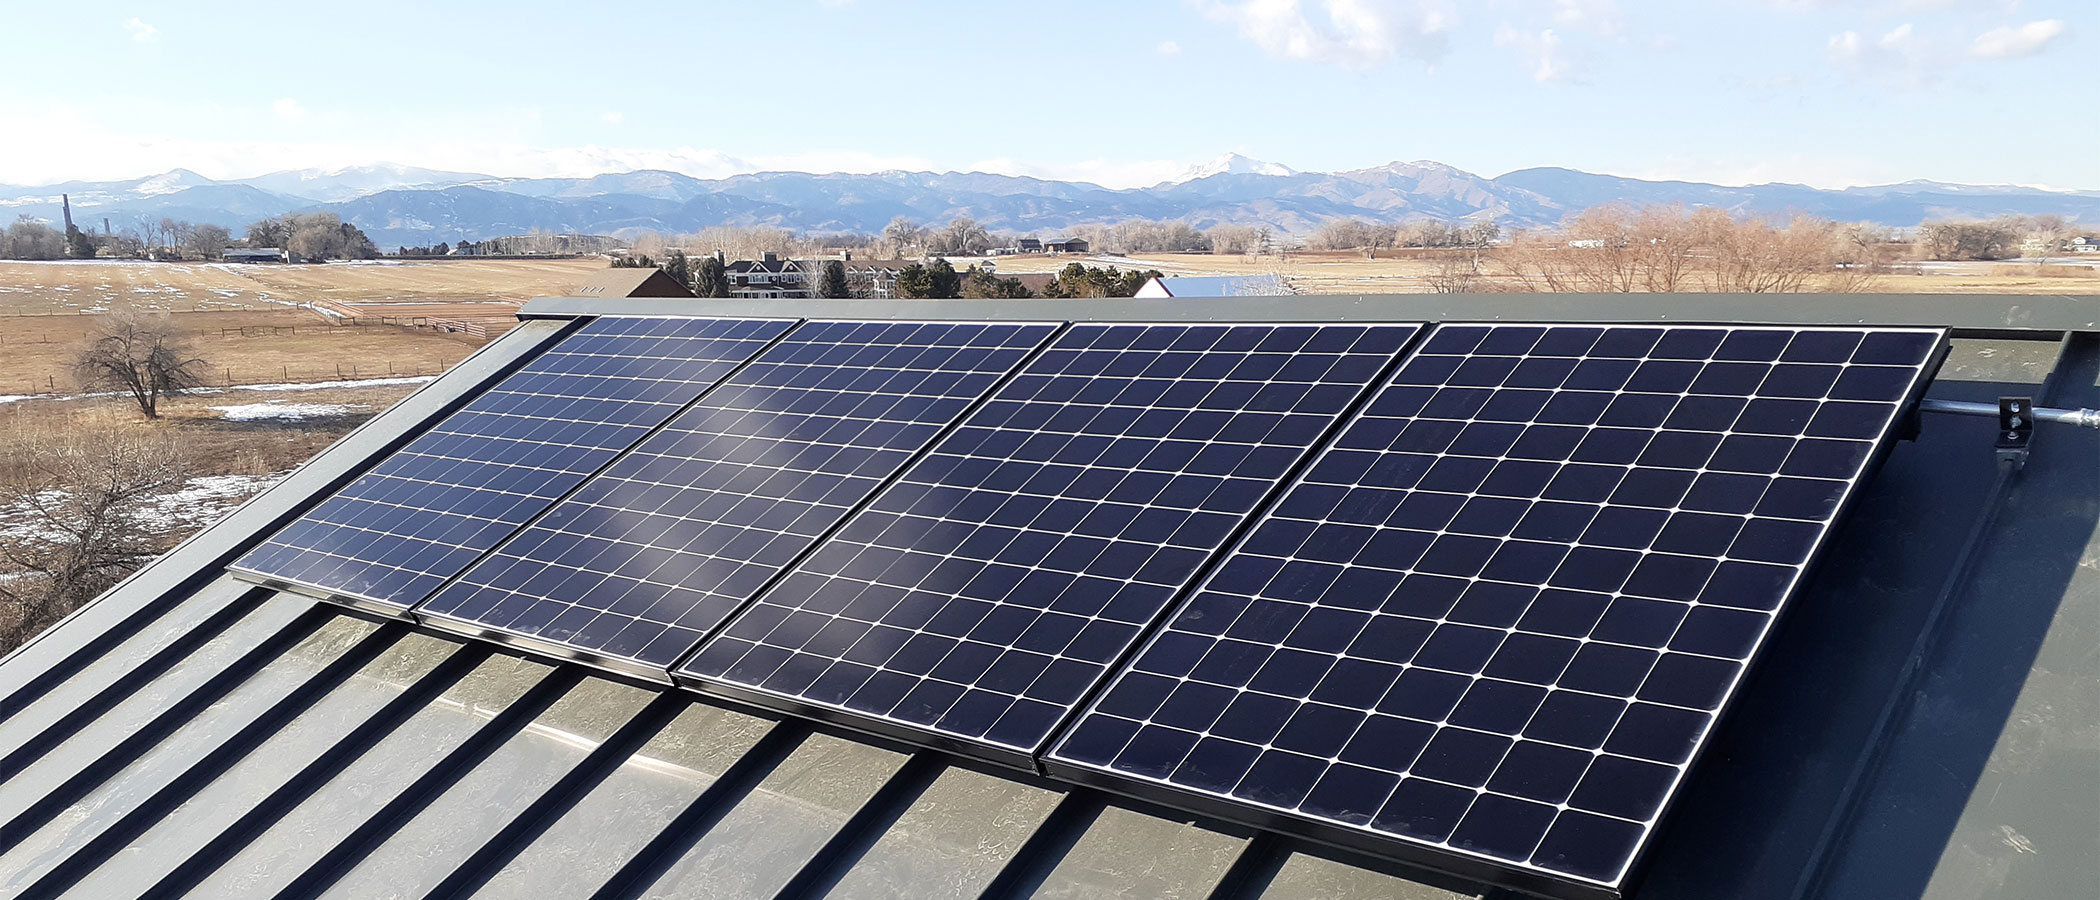 Roofstop solar panels